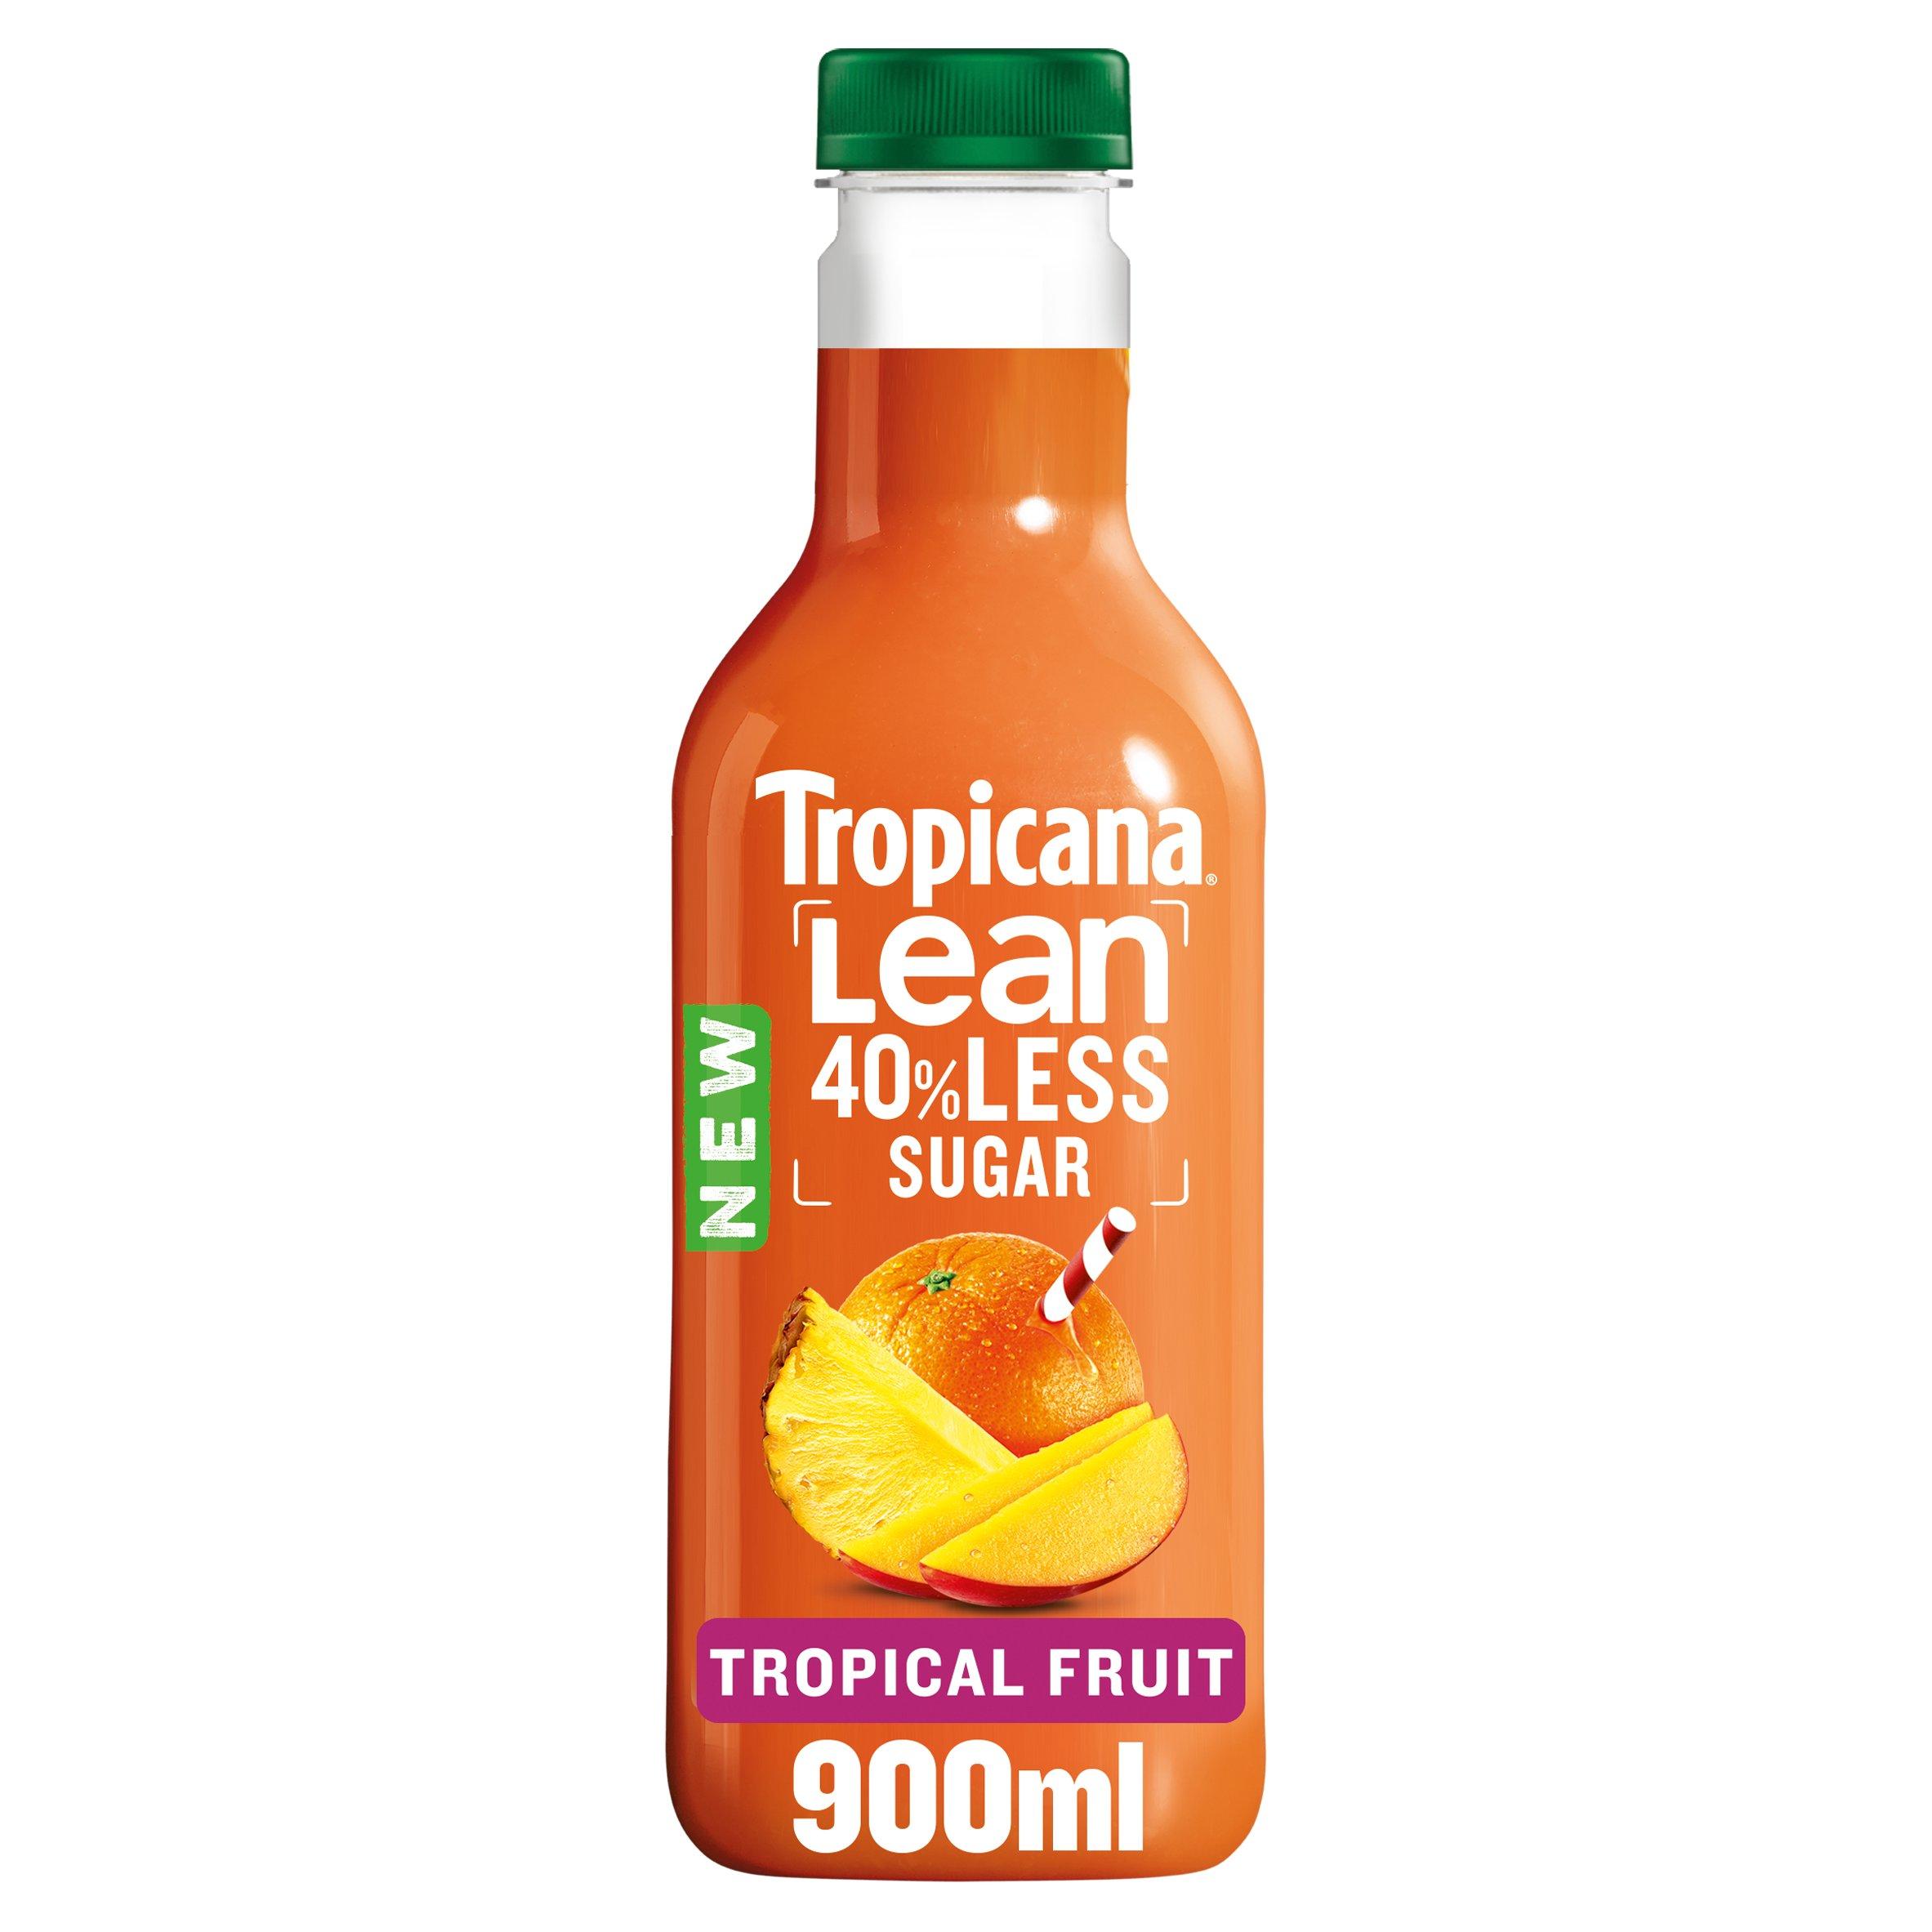 Tropicana Lean Tropical Fruit Juice 900Ml